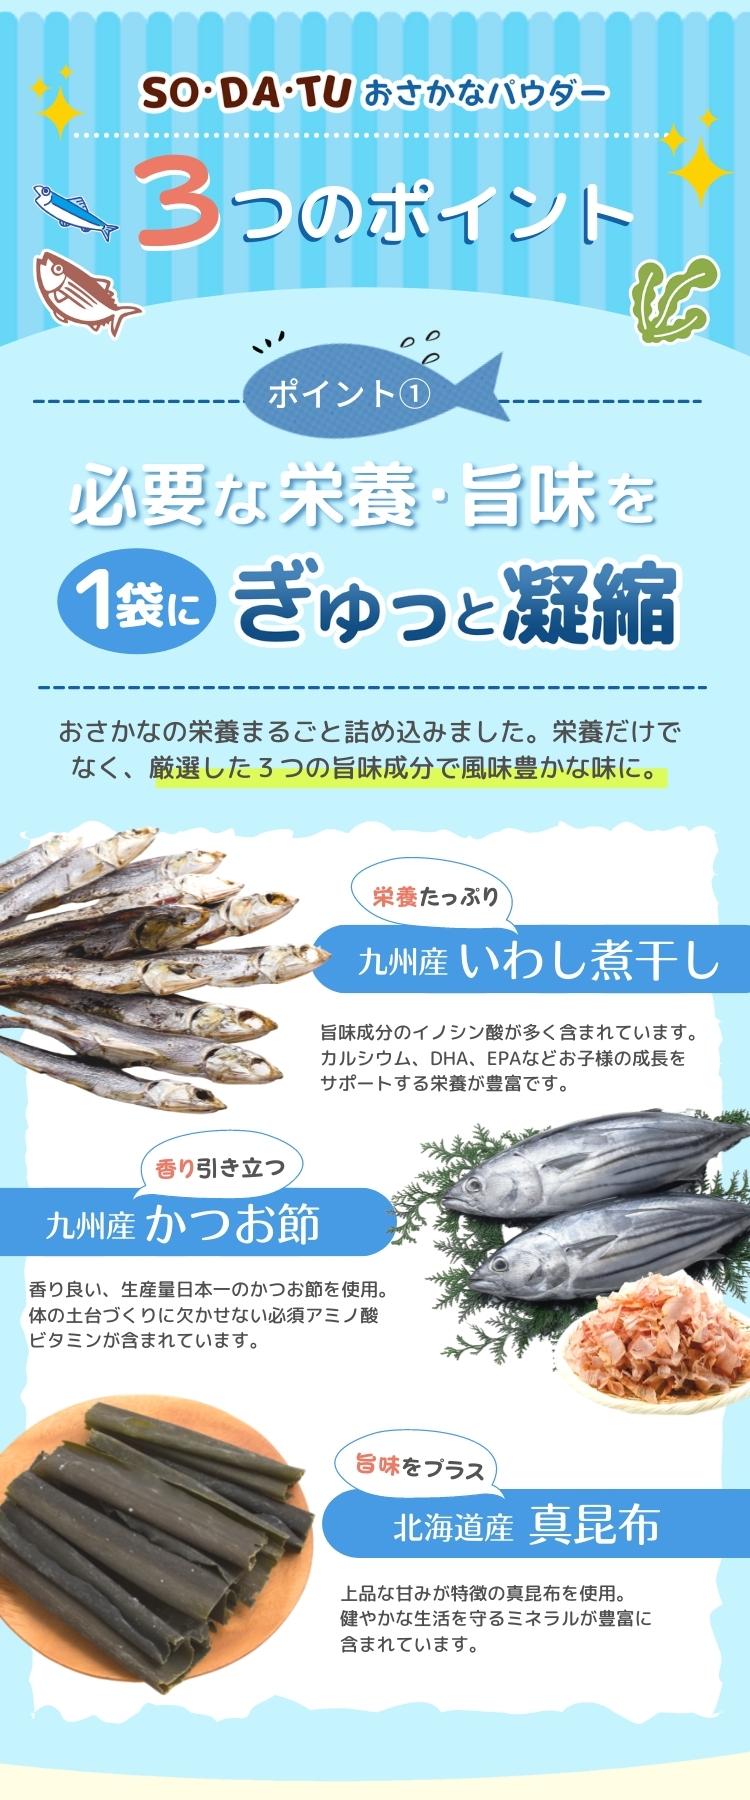 SO・DA・TU おさかなパウダー 九州産いわし煮干し 九州産かつお節 北海道産 真昆布